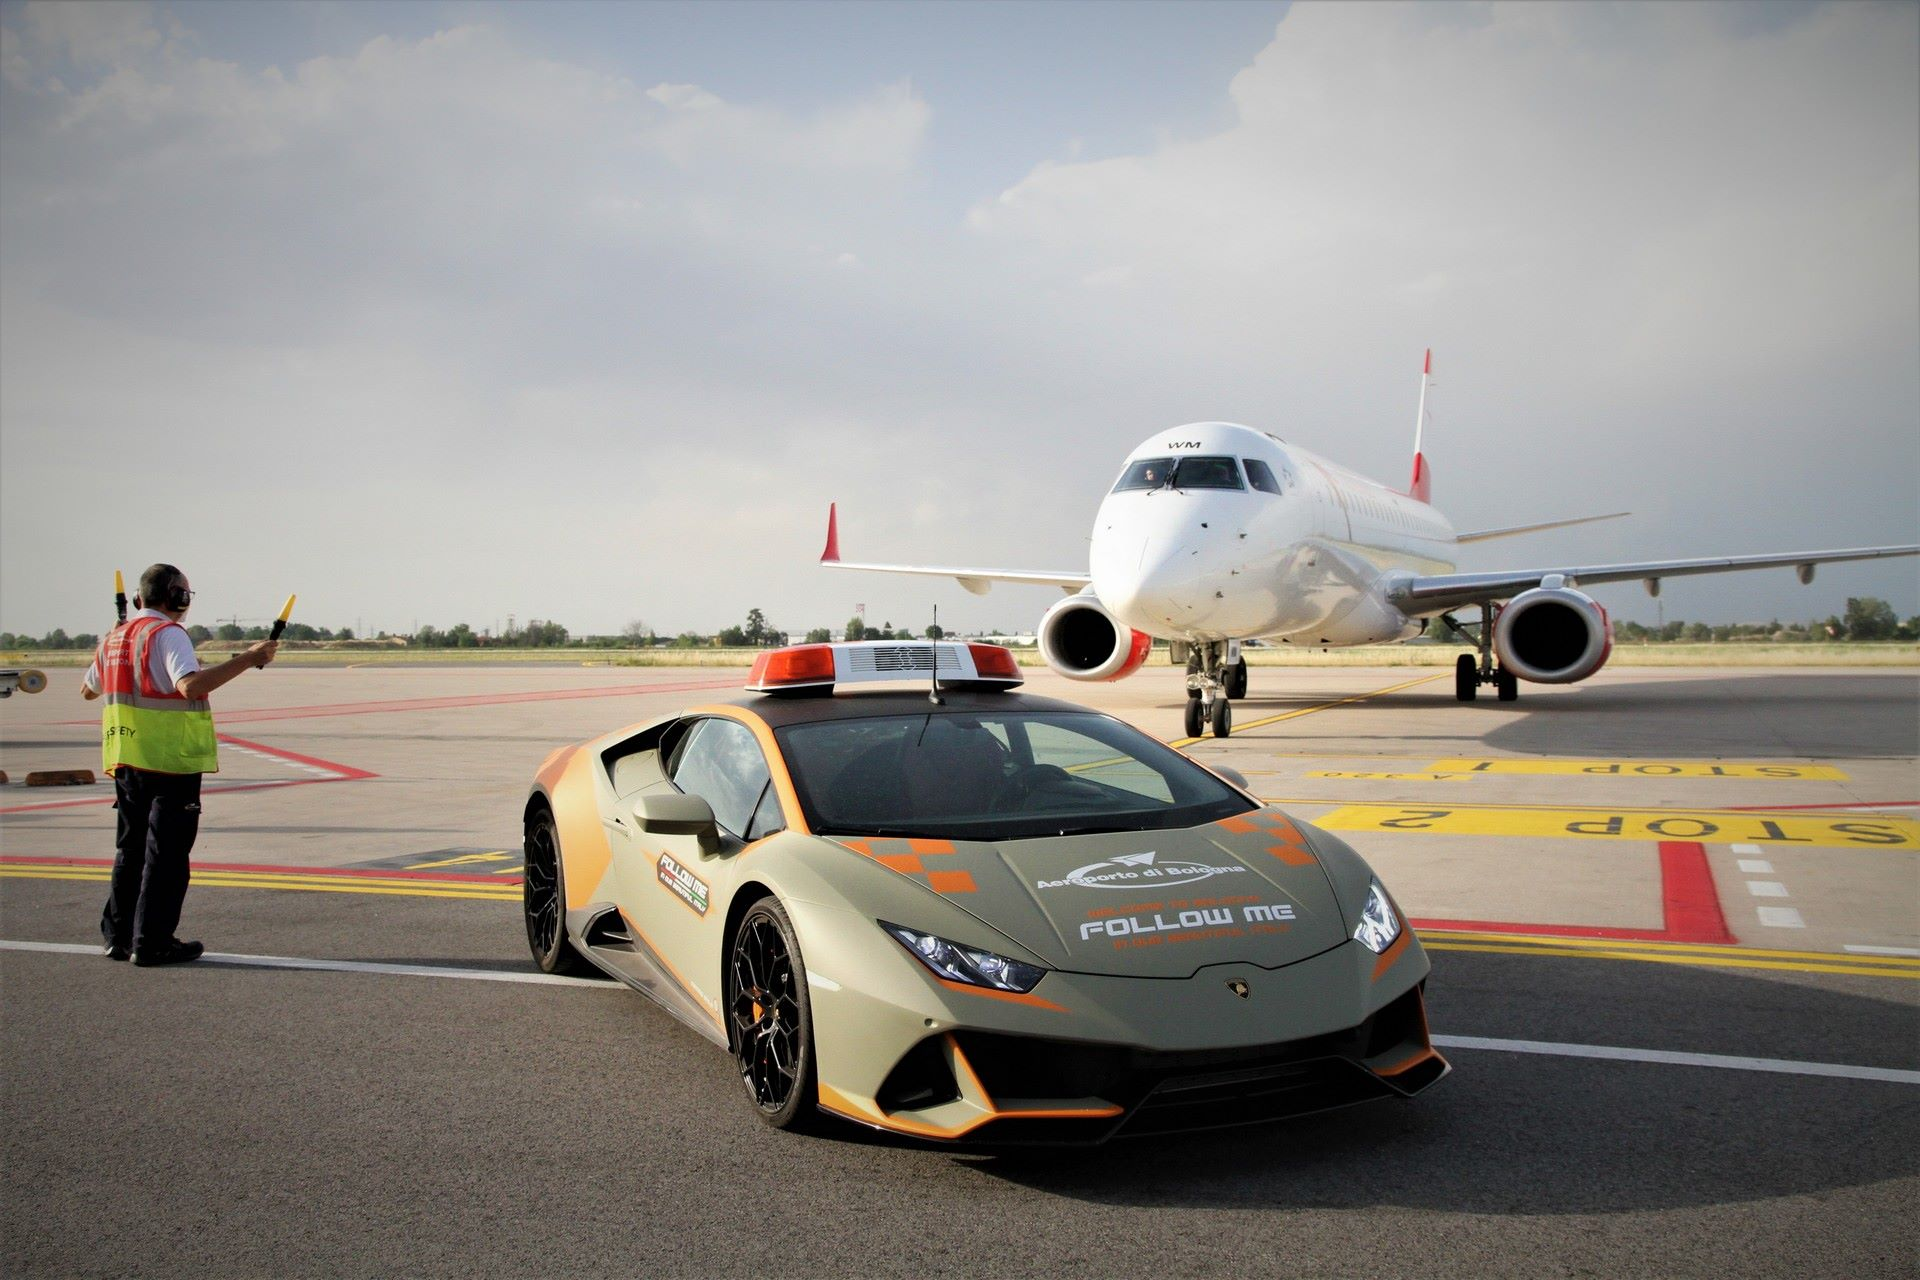 Lamborghini-Huracan-Evo-Follow-Me-bologna-airport-2021-11